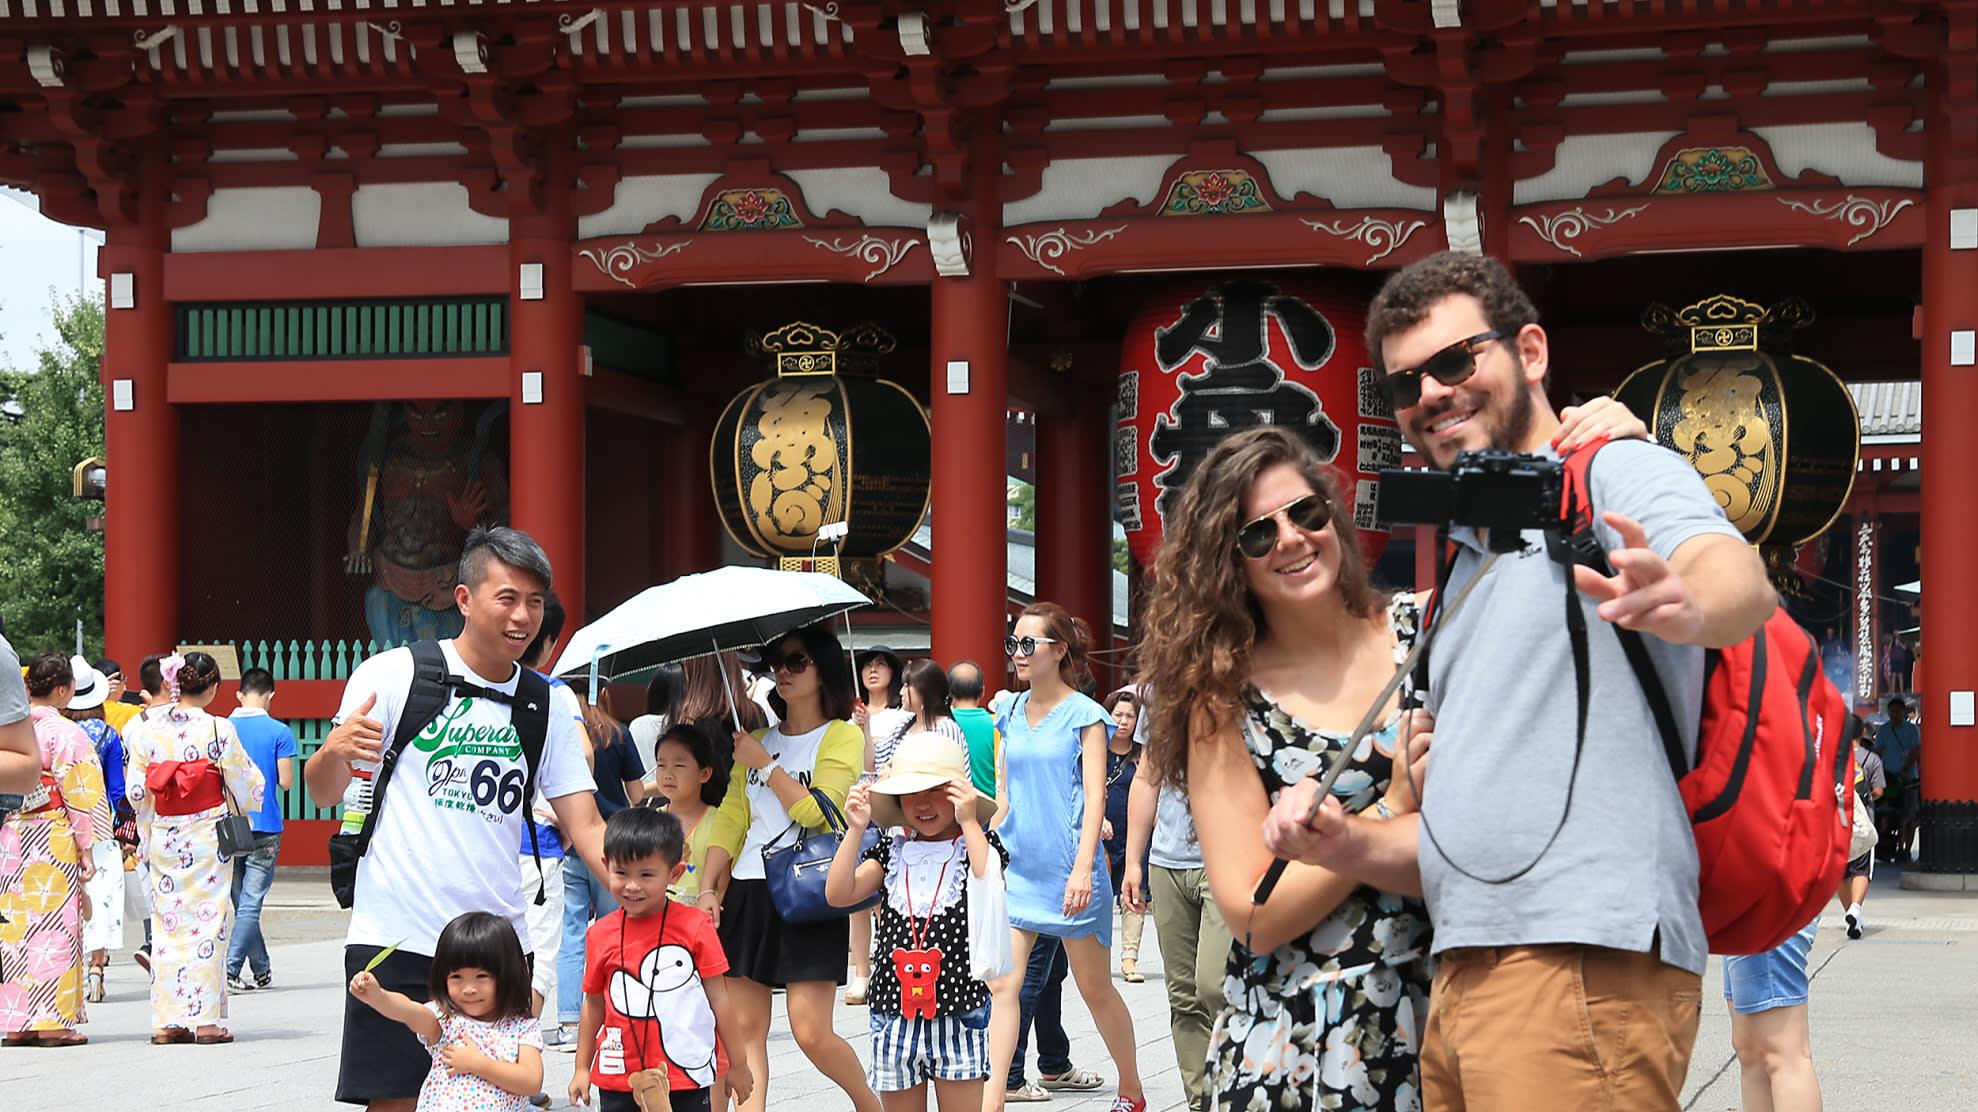 979a34600 Tourists to Japan top 20m